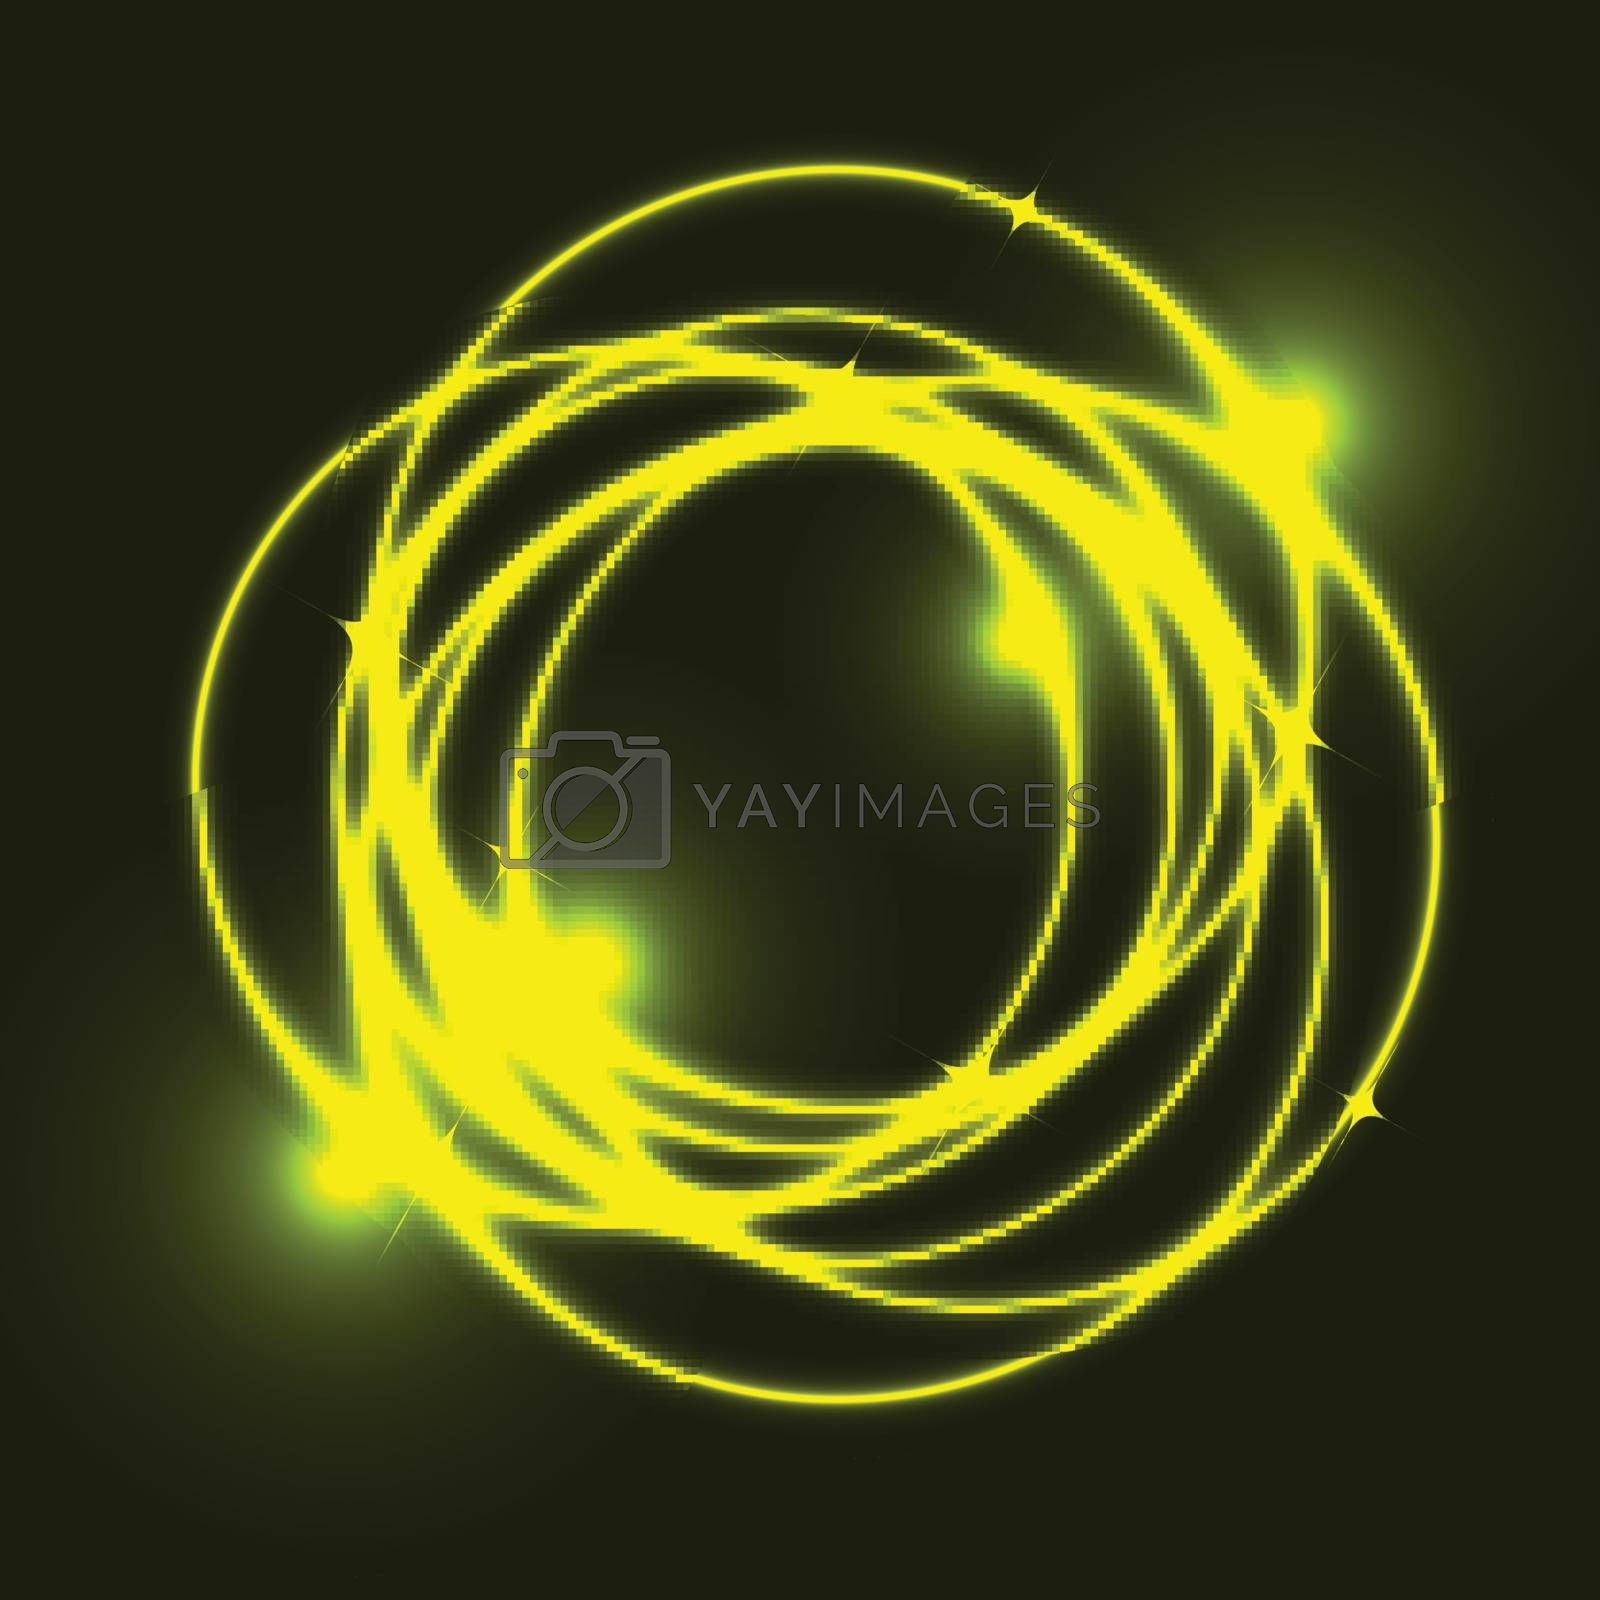 Yellow plasma circle effect background, stock vector